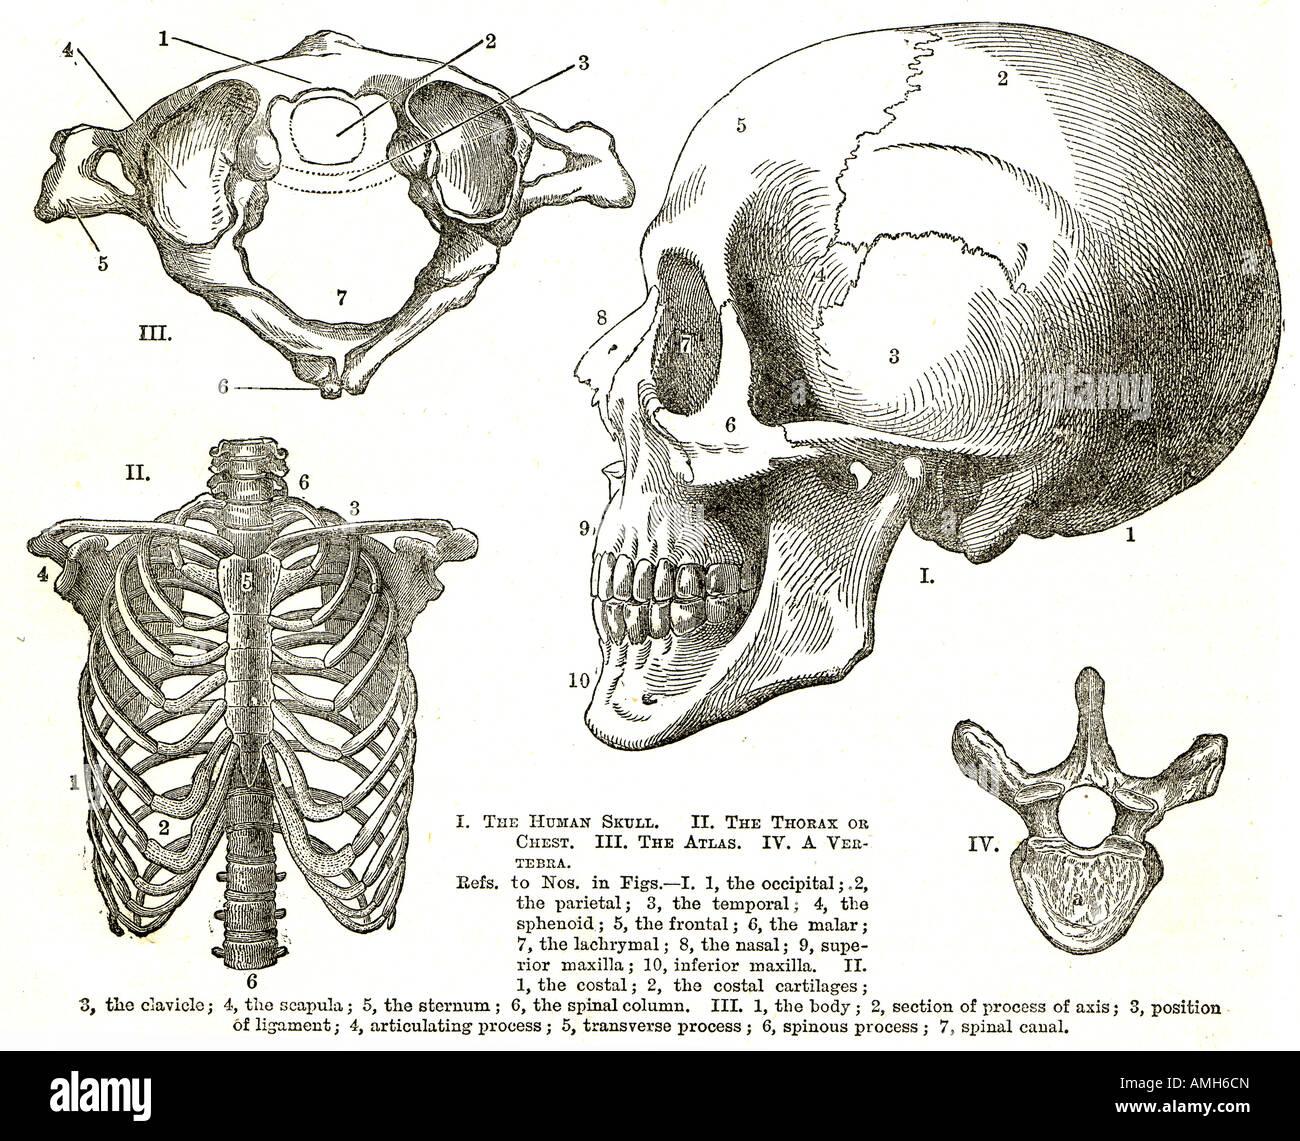 hight resolution of scull rib cage thorax chest atlas vertebra upper torso diagram chart medical anatomy anatomical hospital doctor teaching aid sho